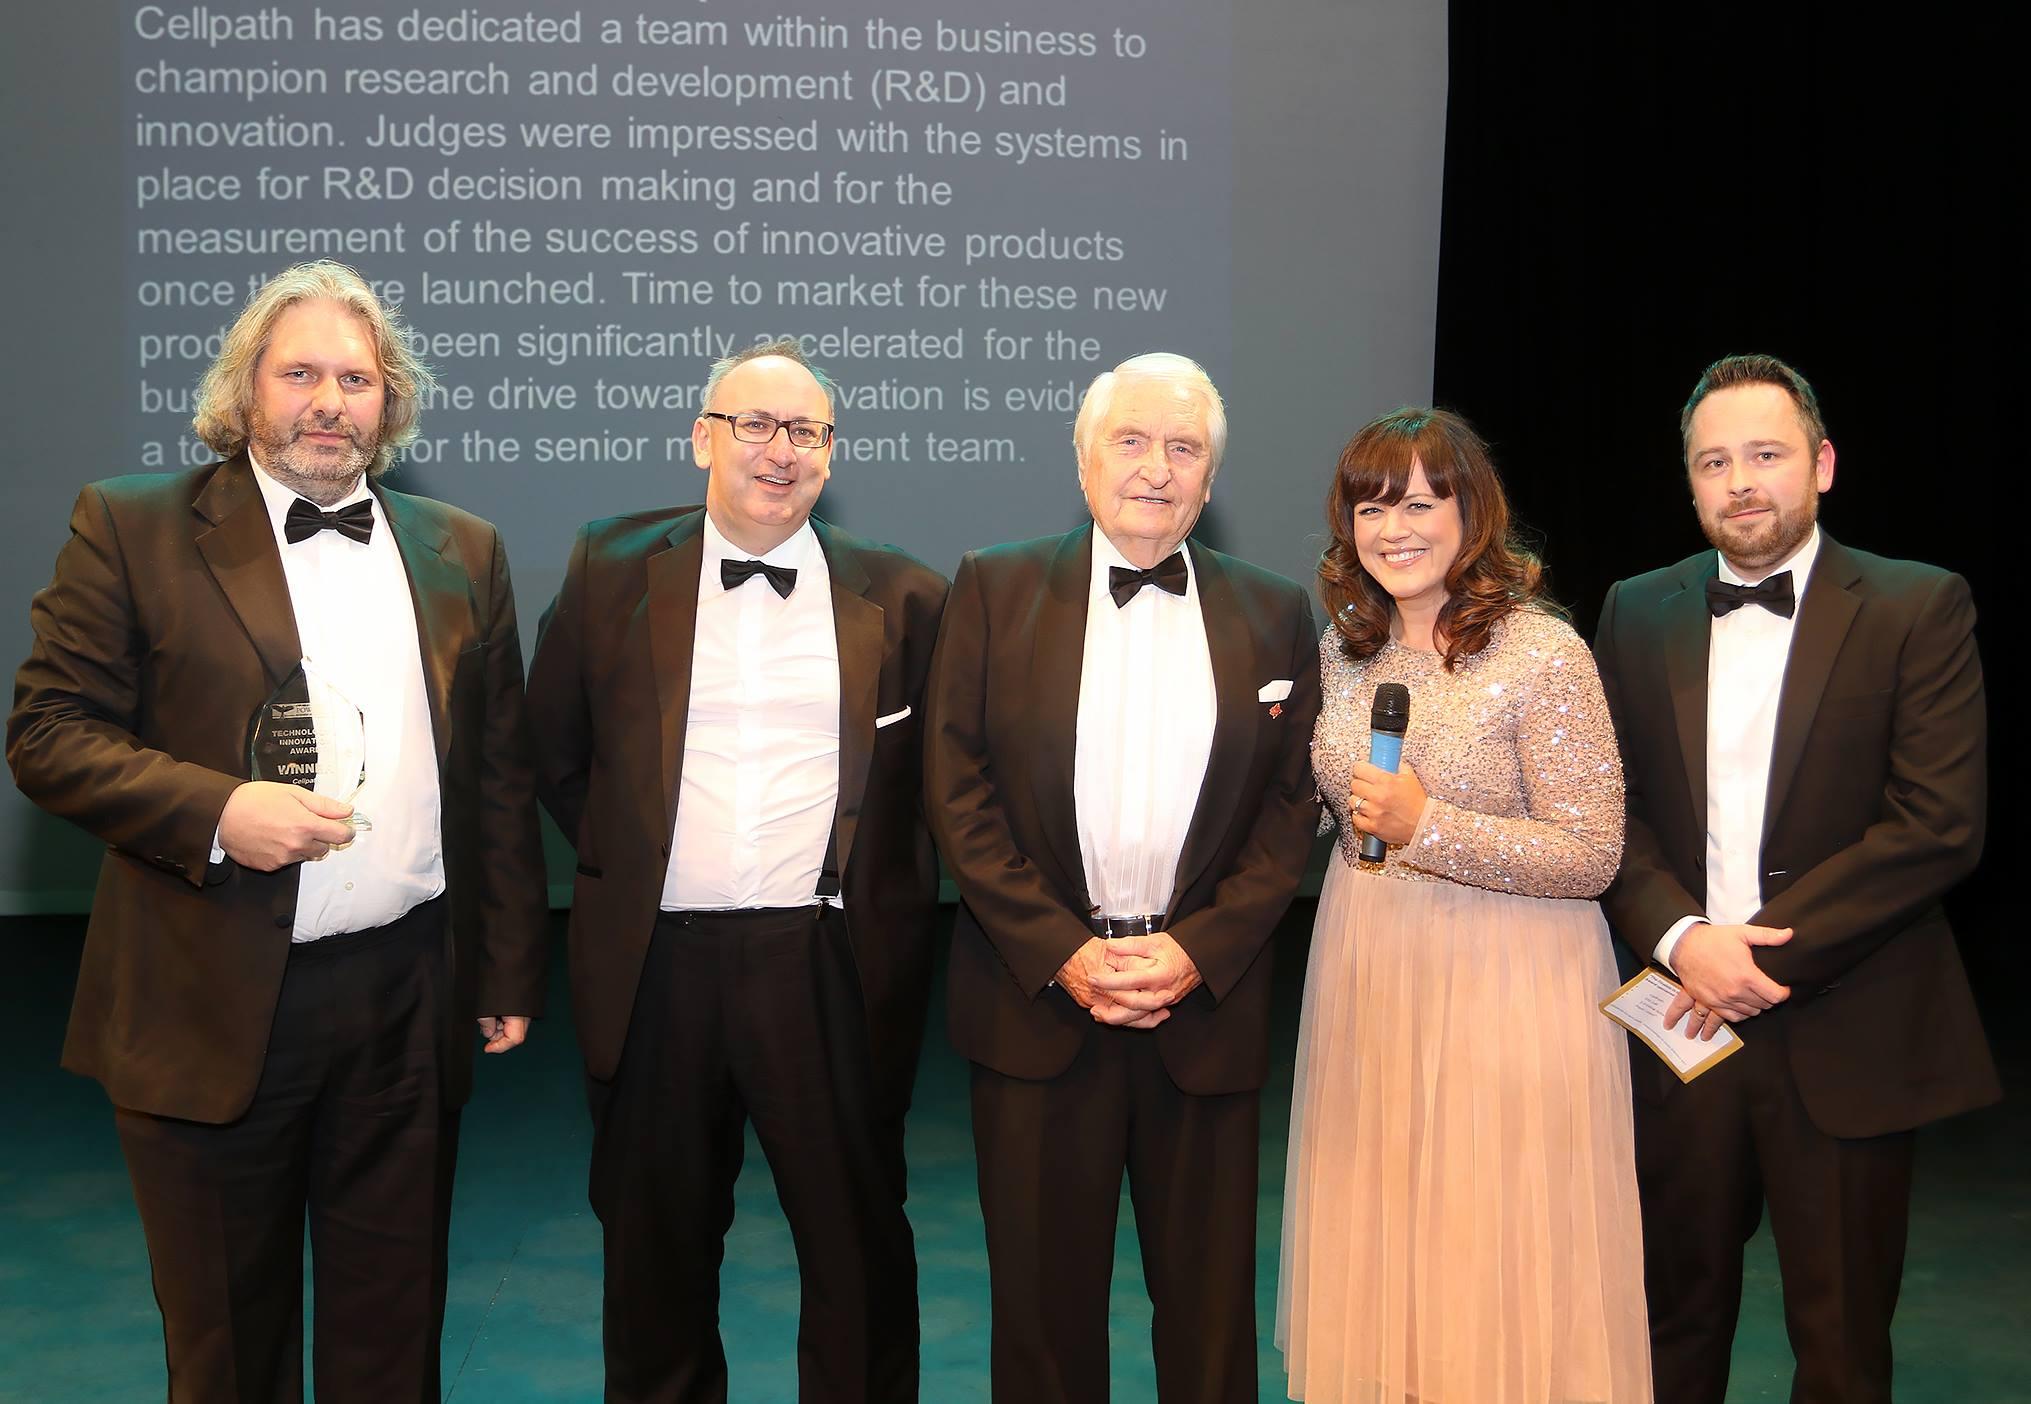 Powys Business Awards CellPath